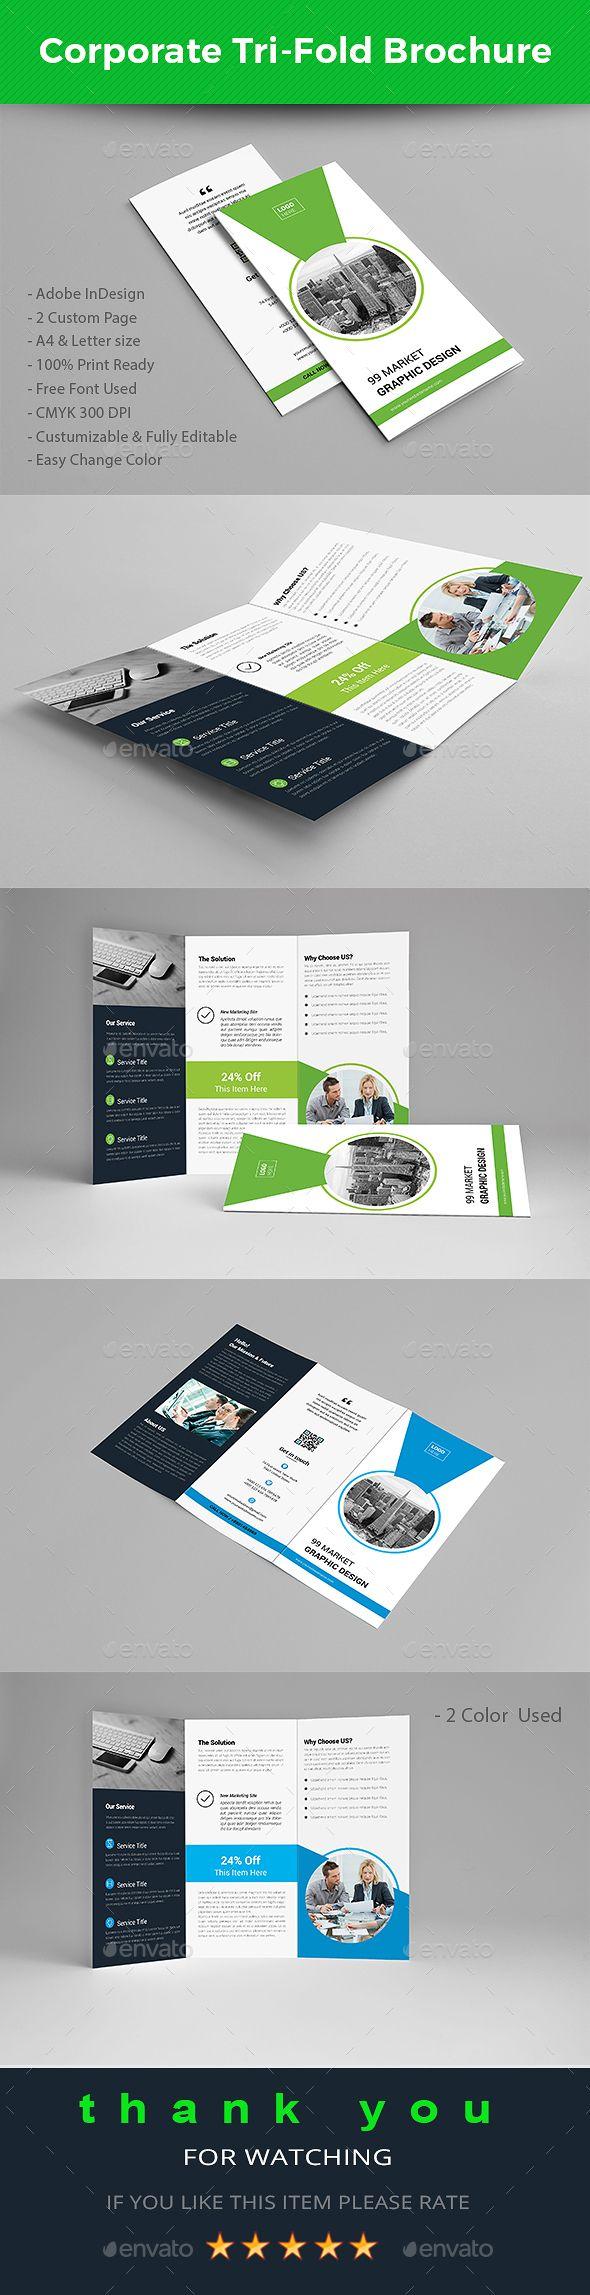 Corporate Trifold Brochure Tri Fold Brochure Brochures And - Trifold brochure template indesign